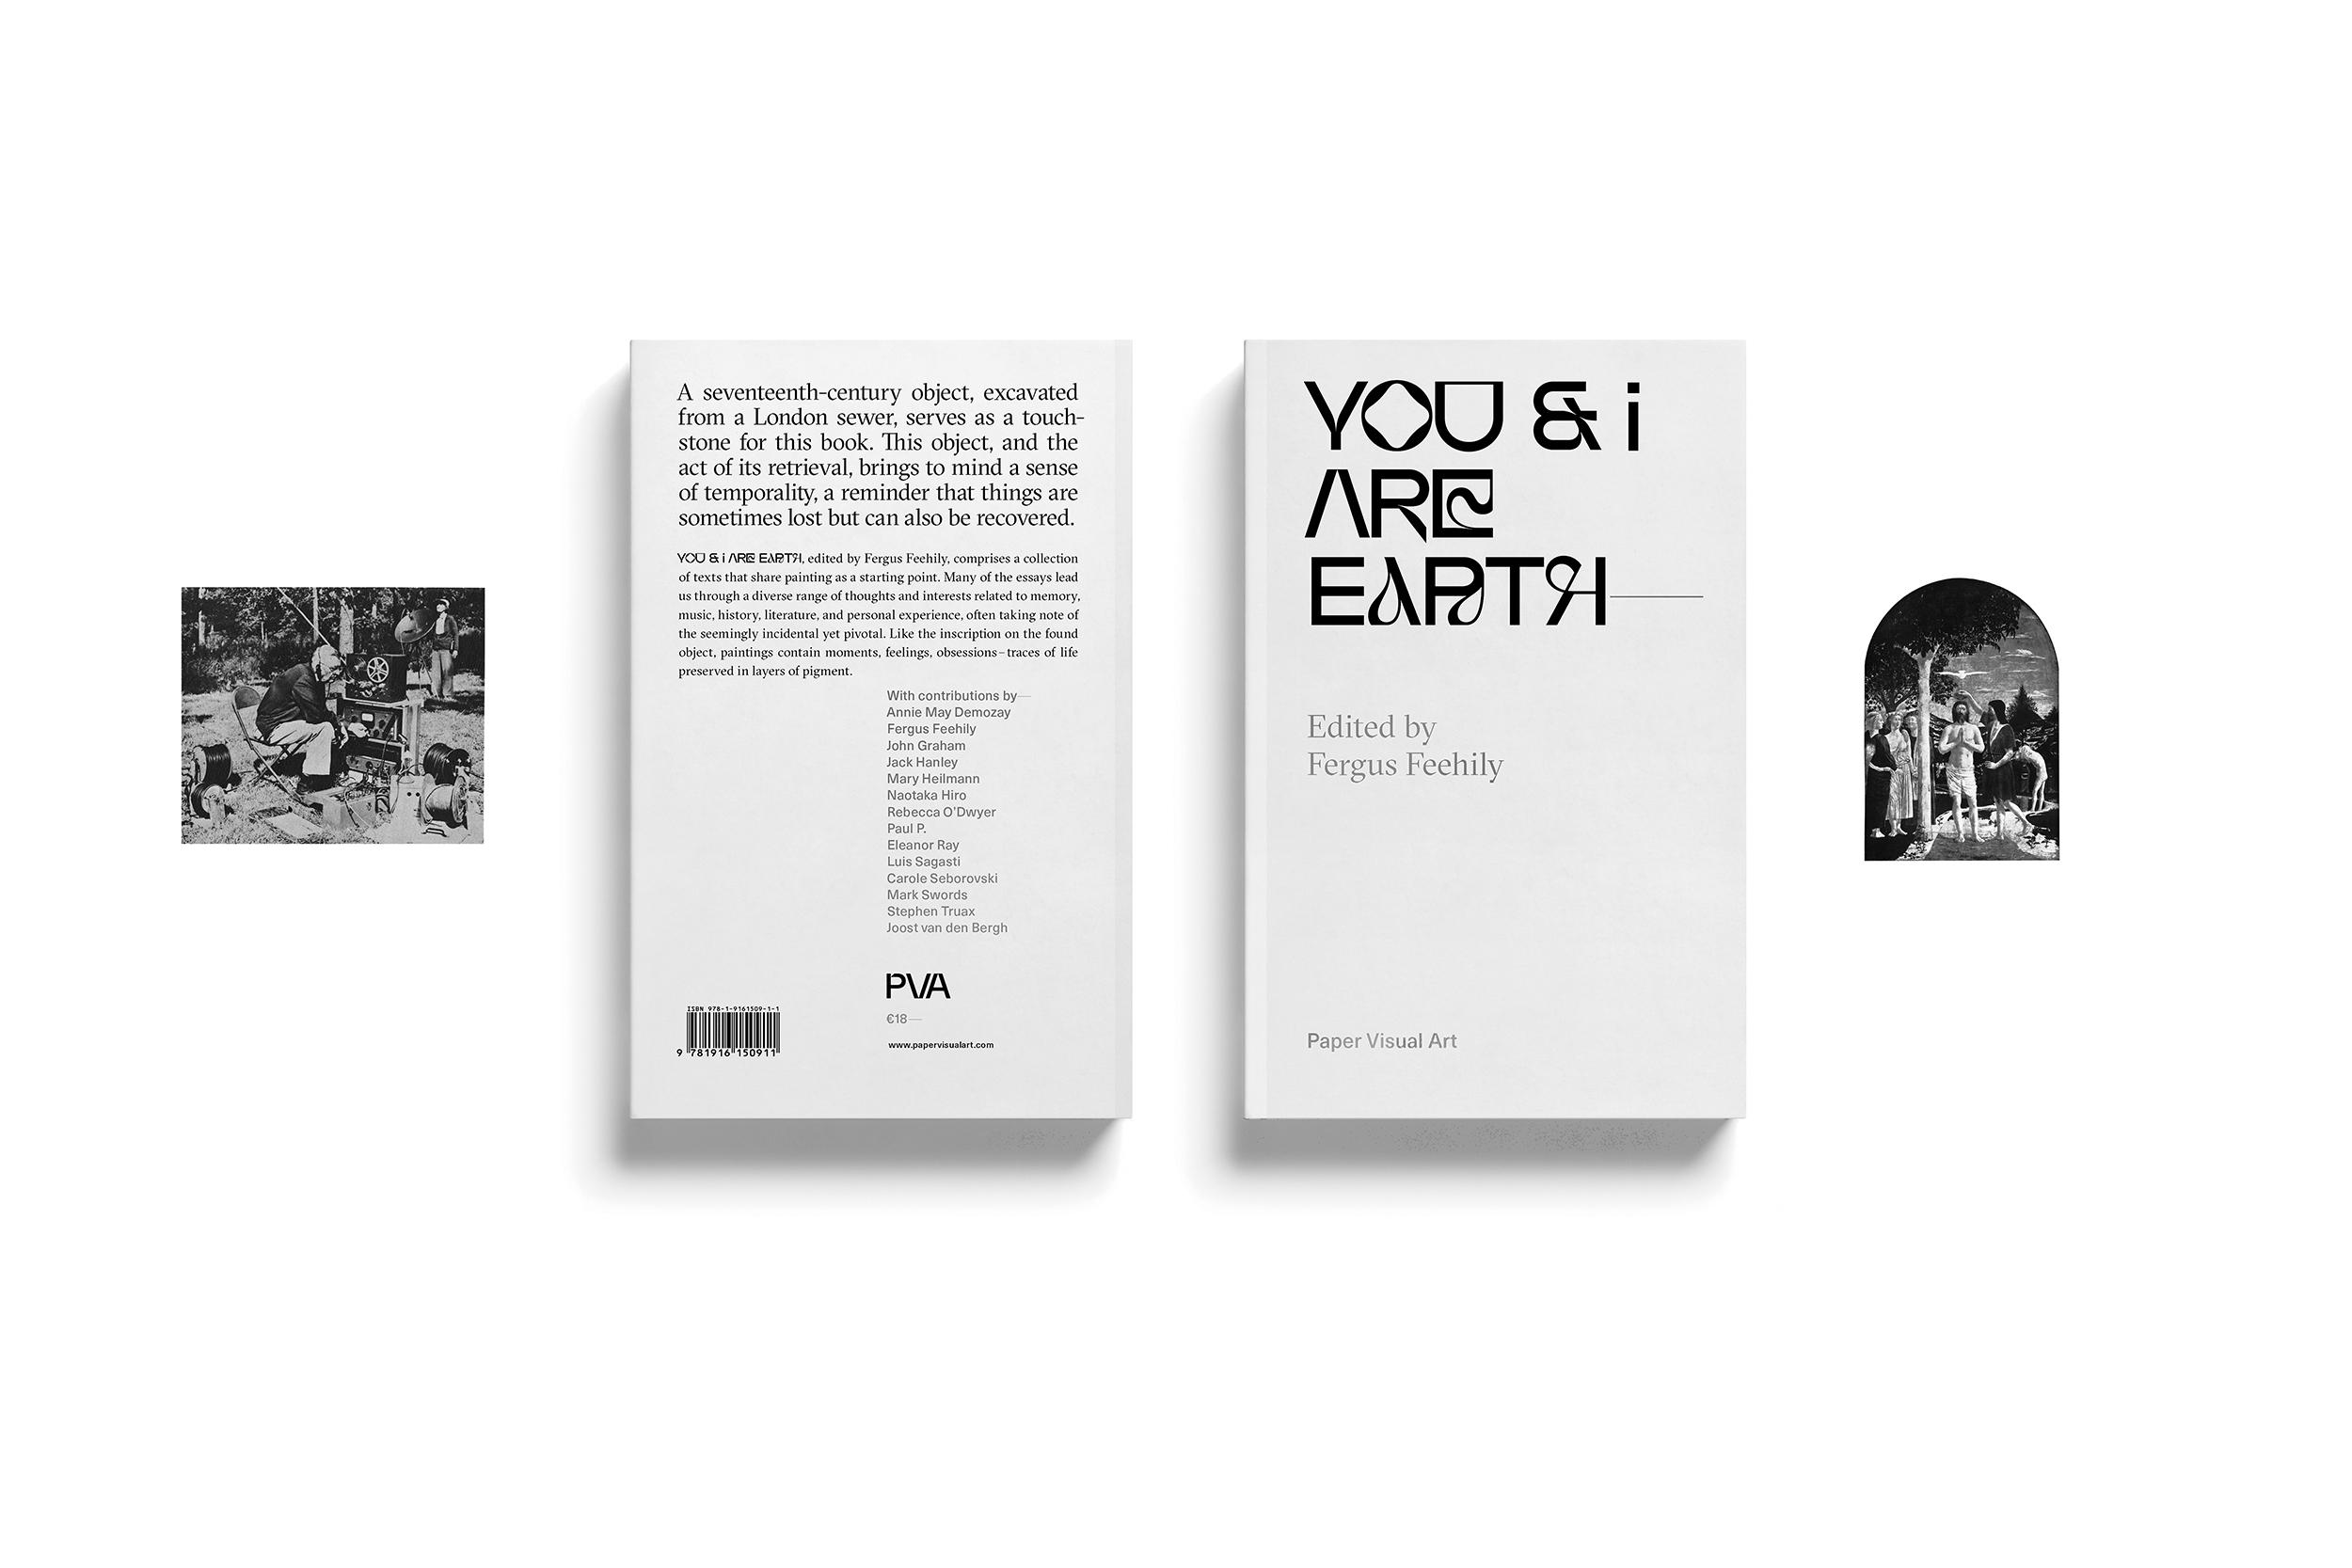 Cover image: You & i are Earth – Fergus Feehily